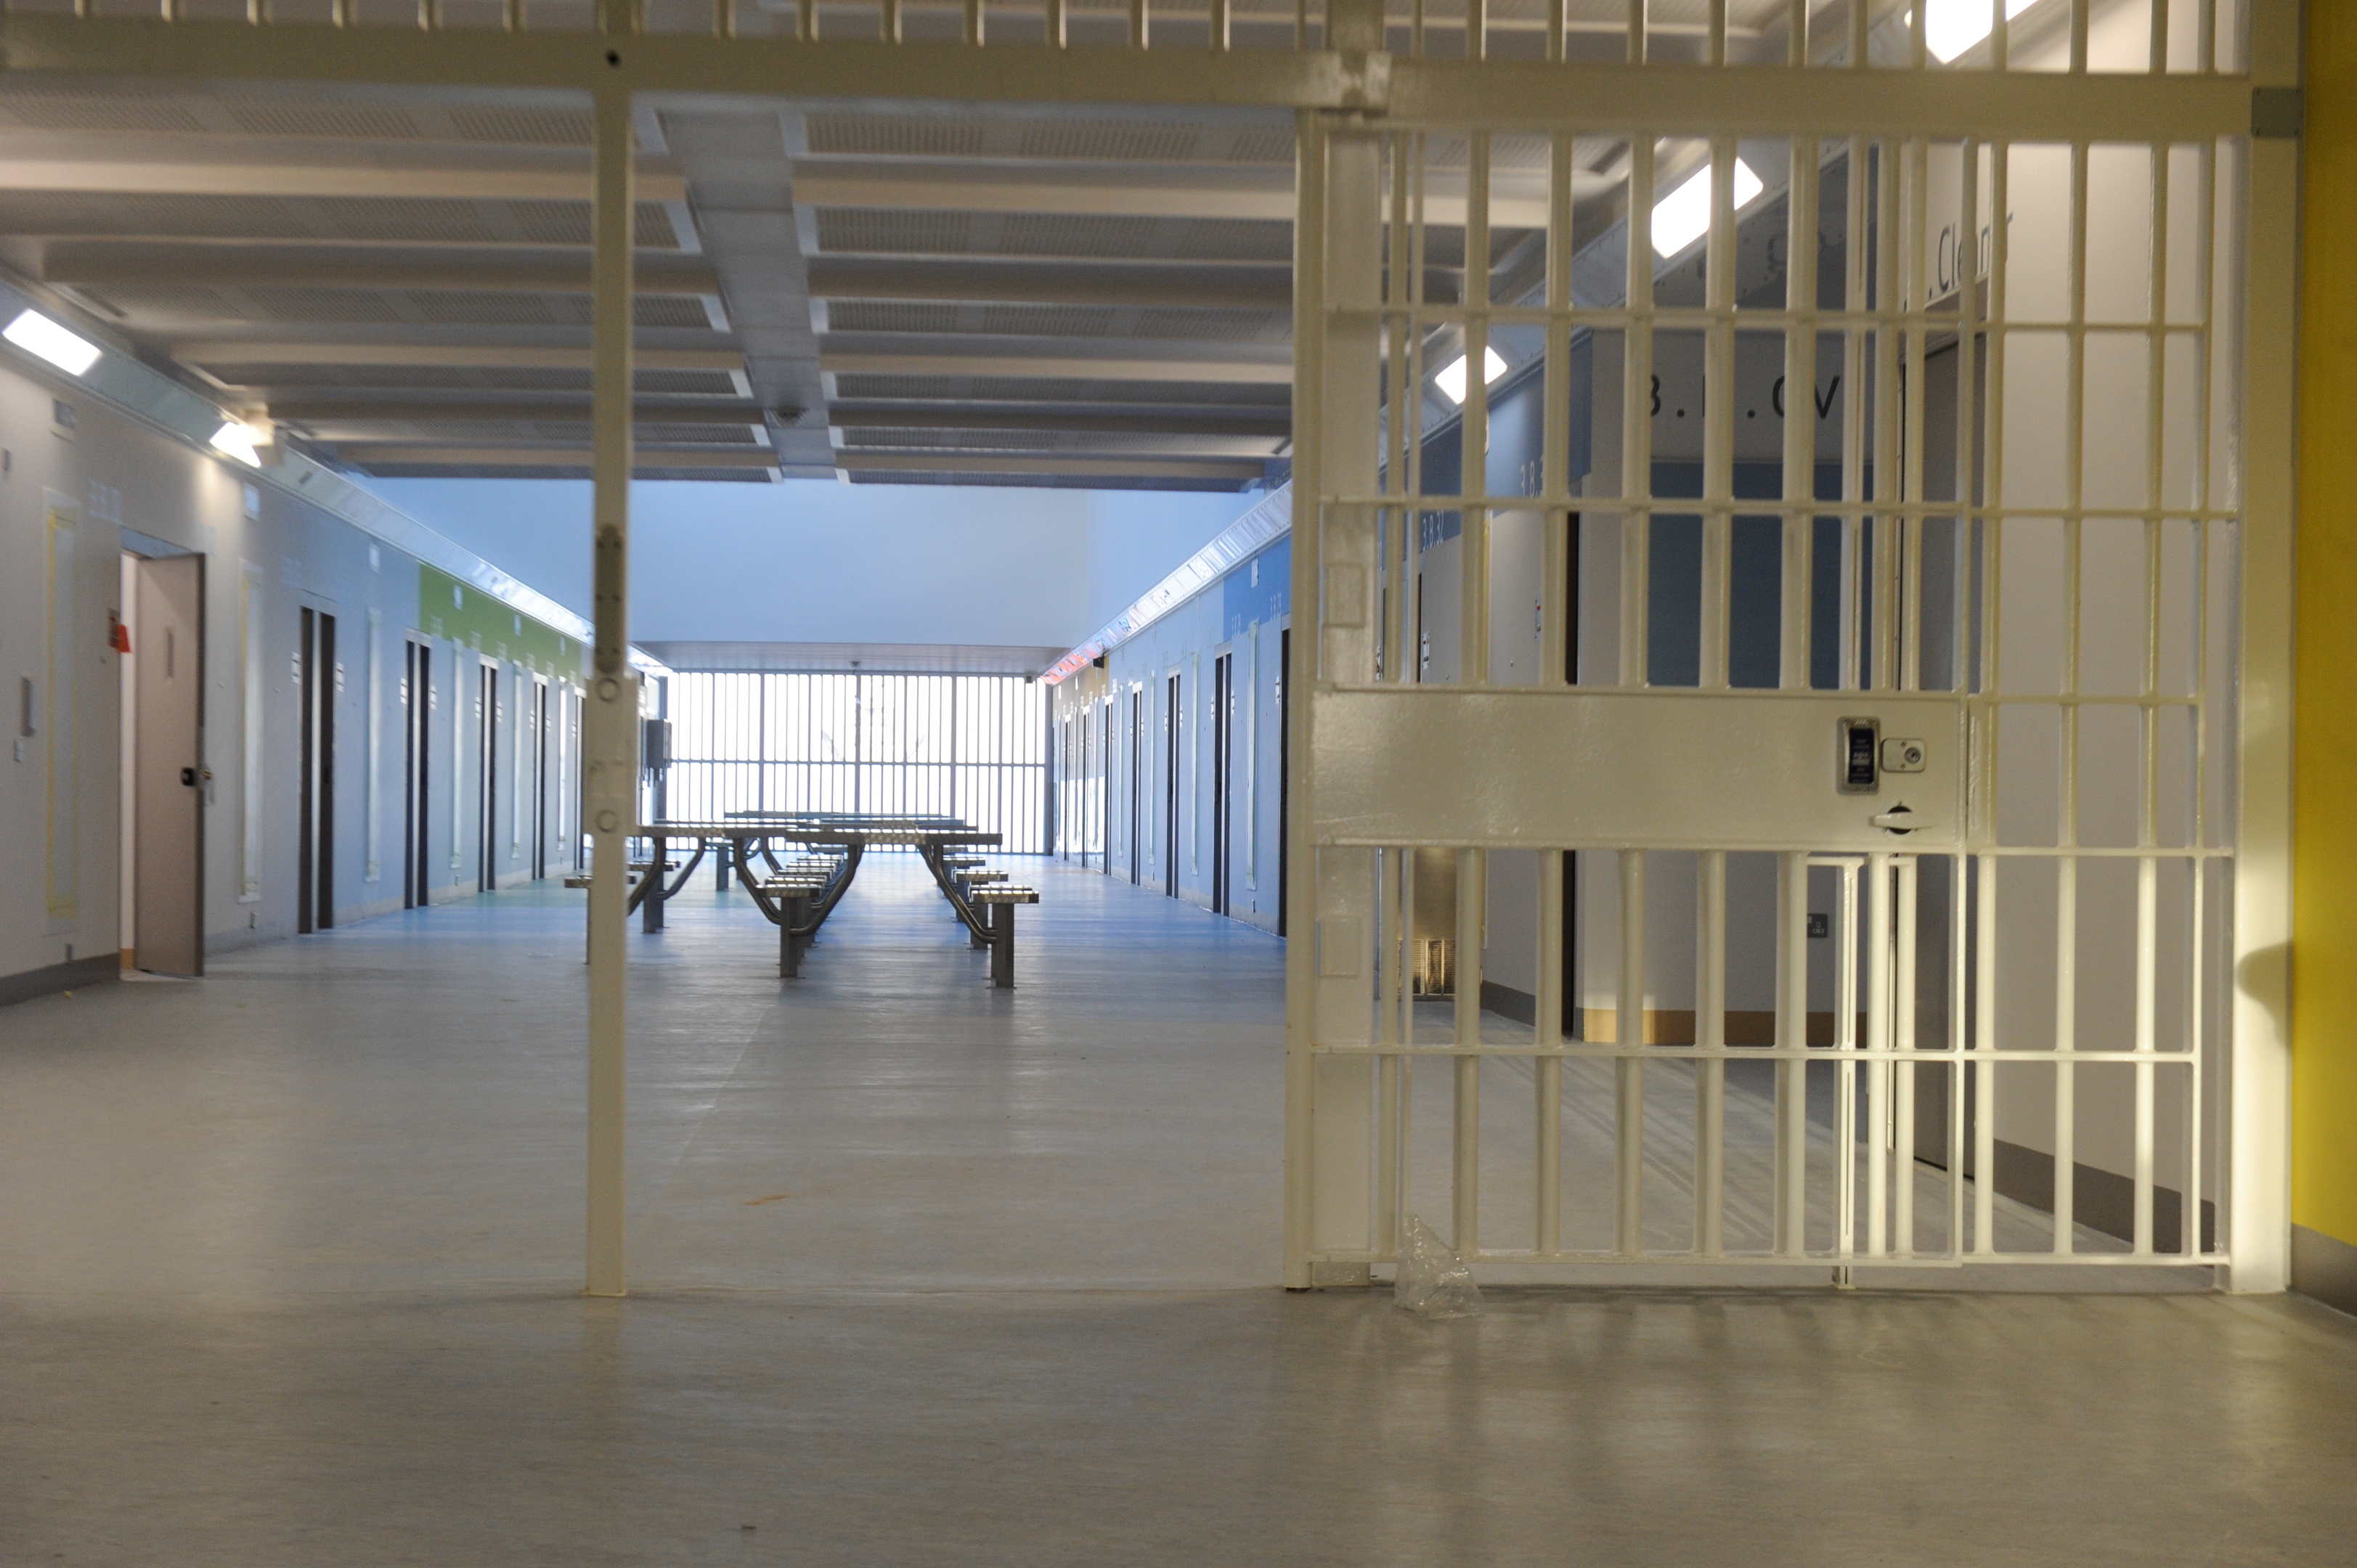 Grievances have been raised by prisoners at HMP Grampian Prison.